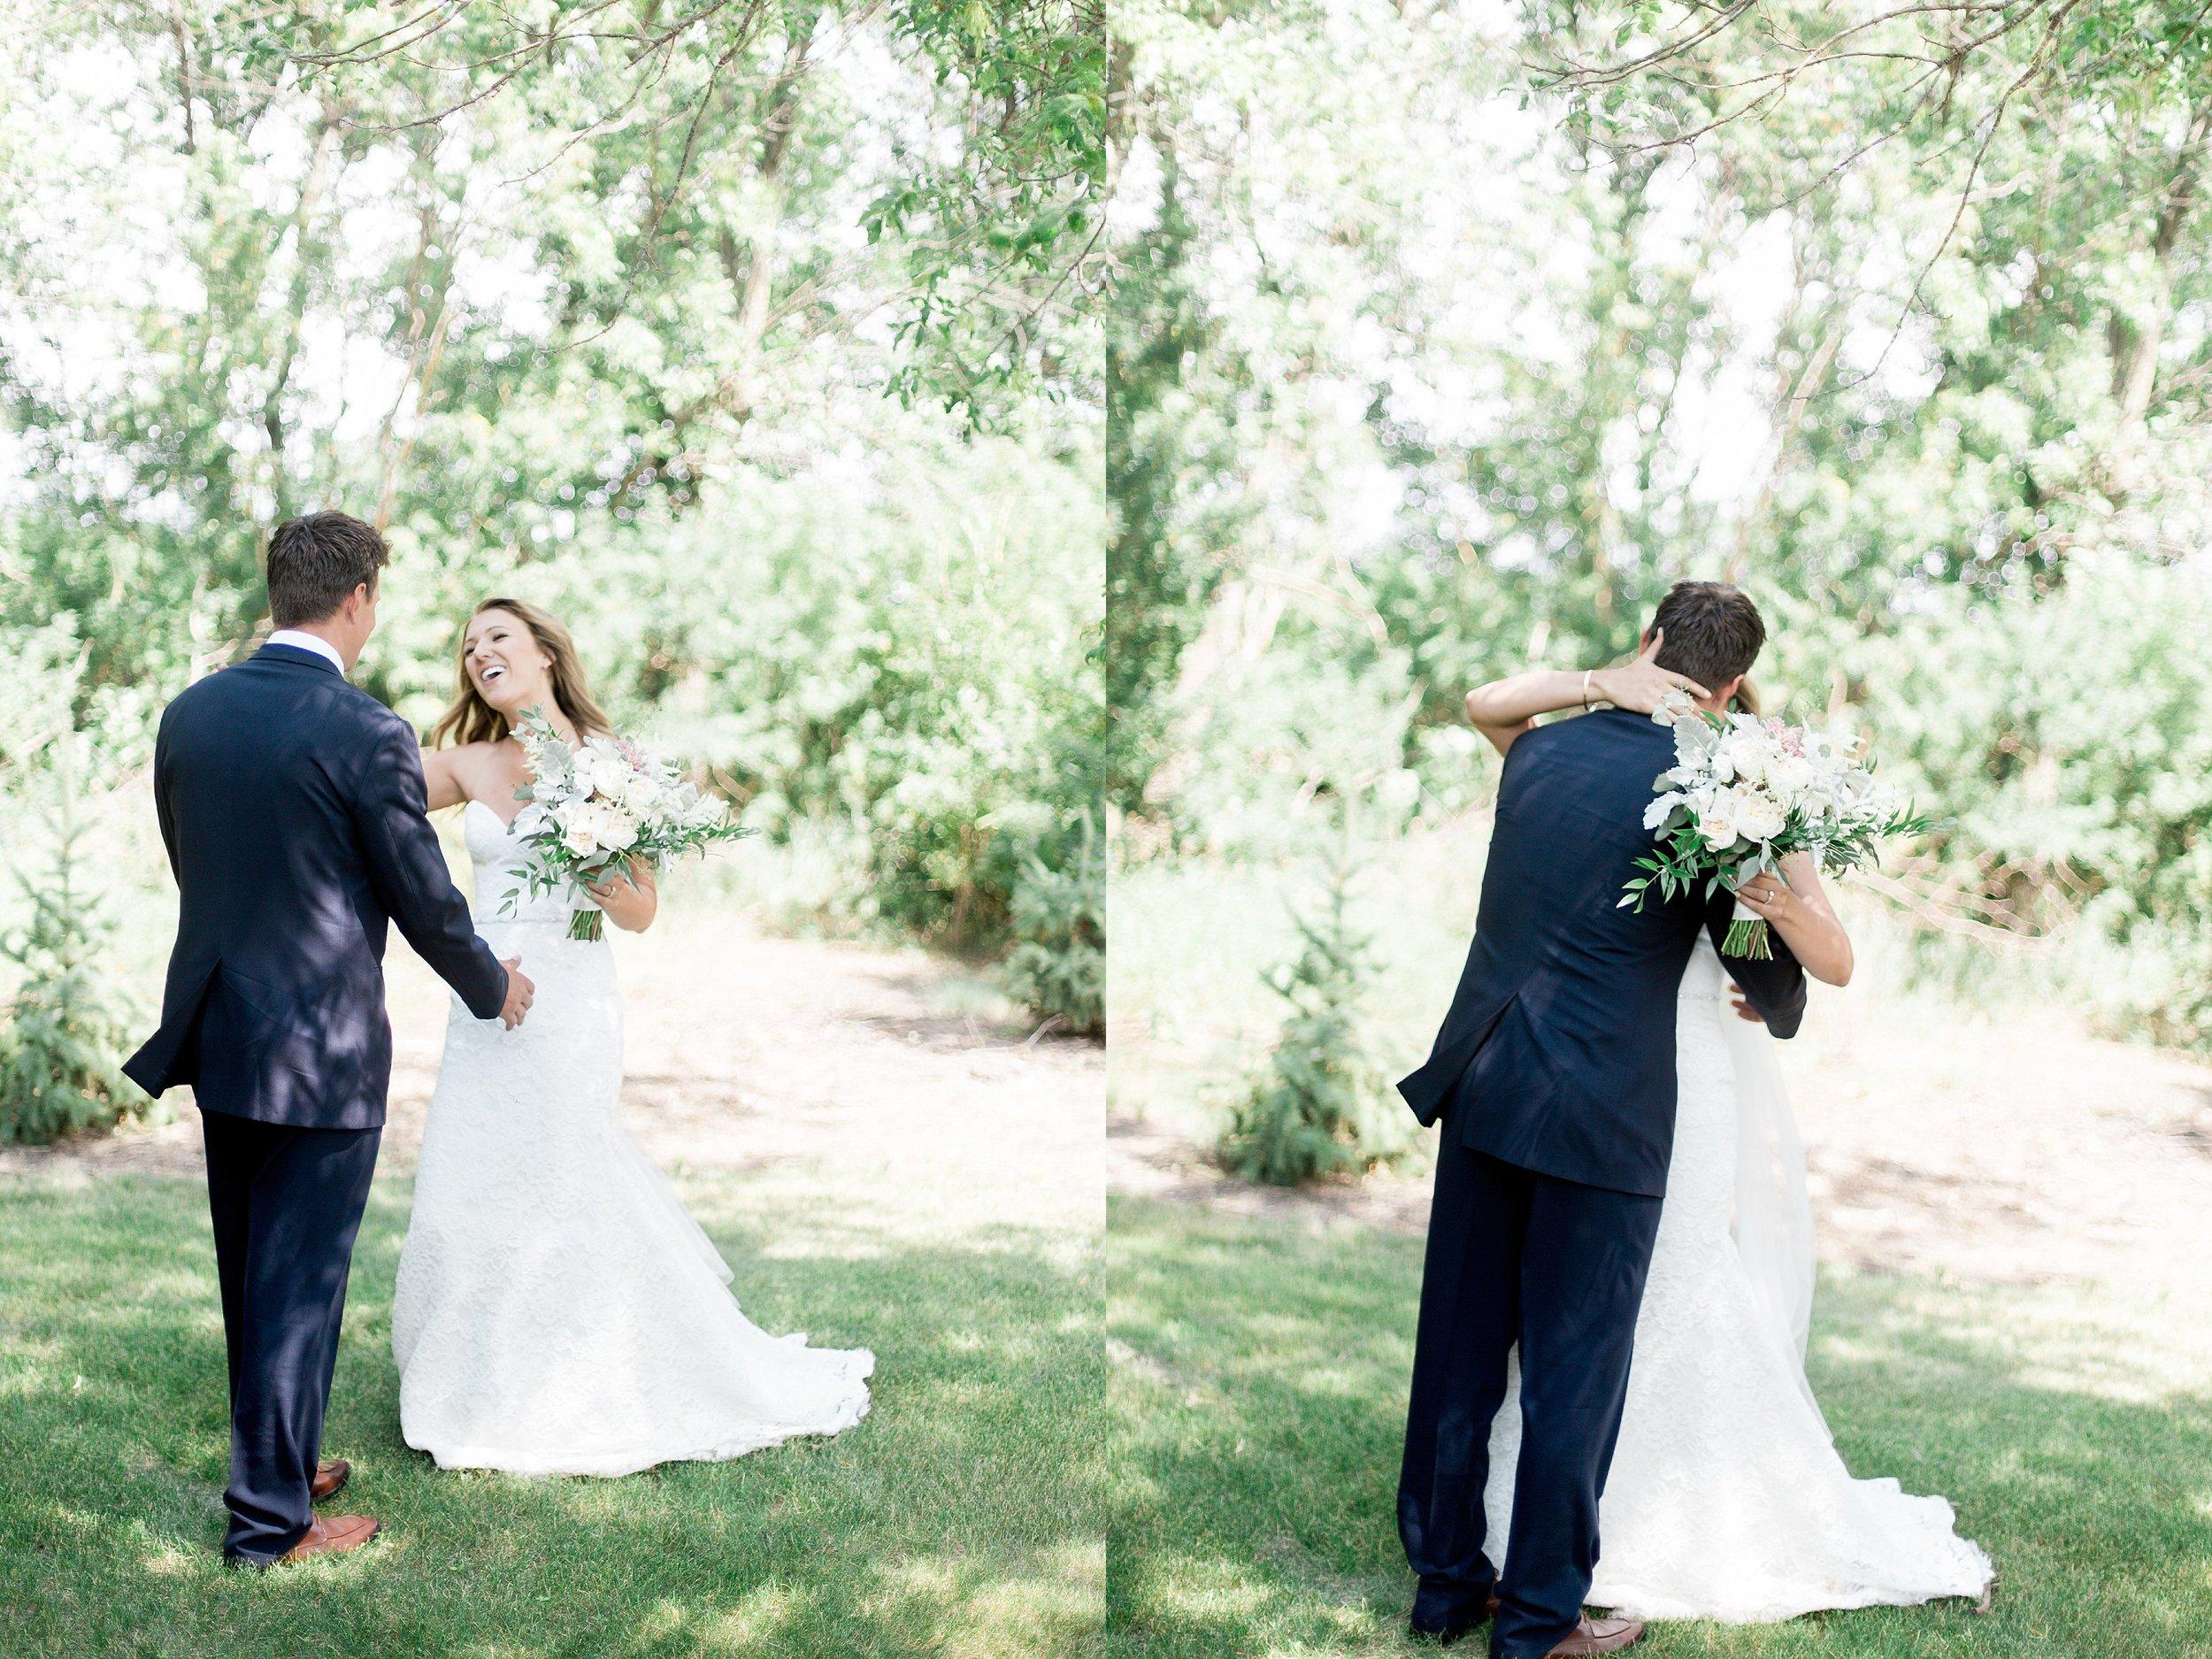 Keila Marie Photography Winnipeg Wedding Photographer   First look photos